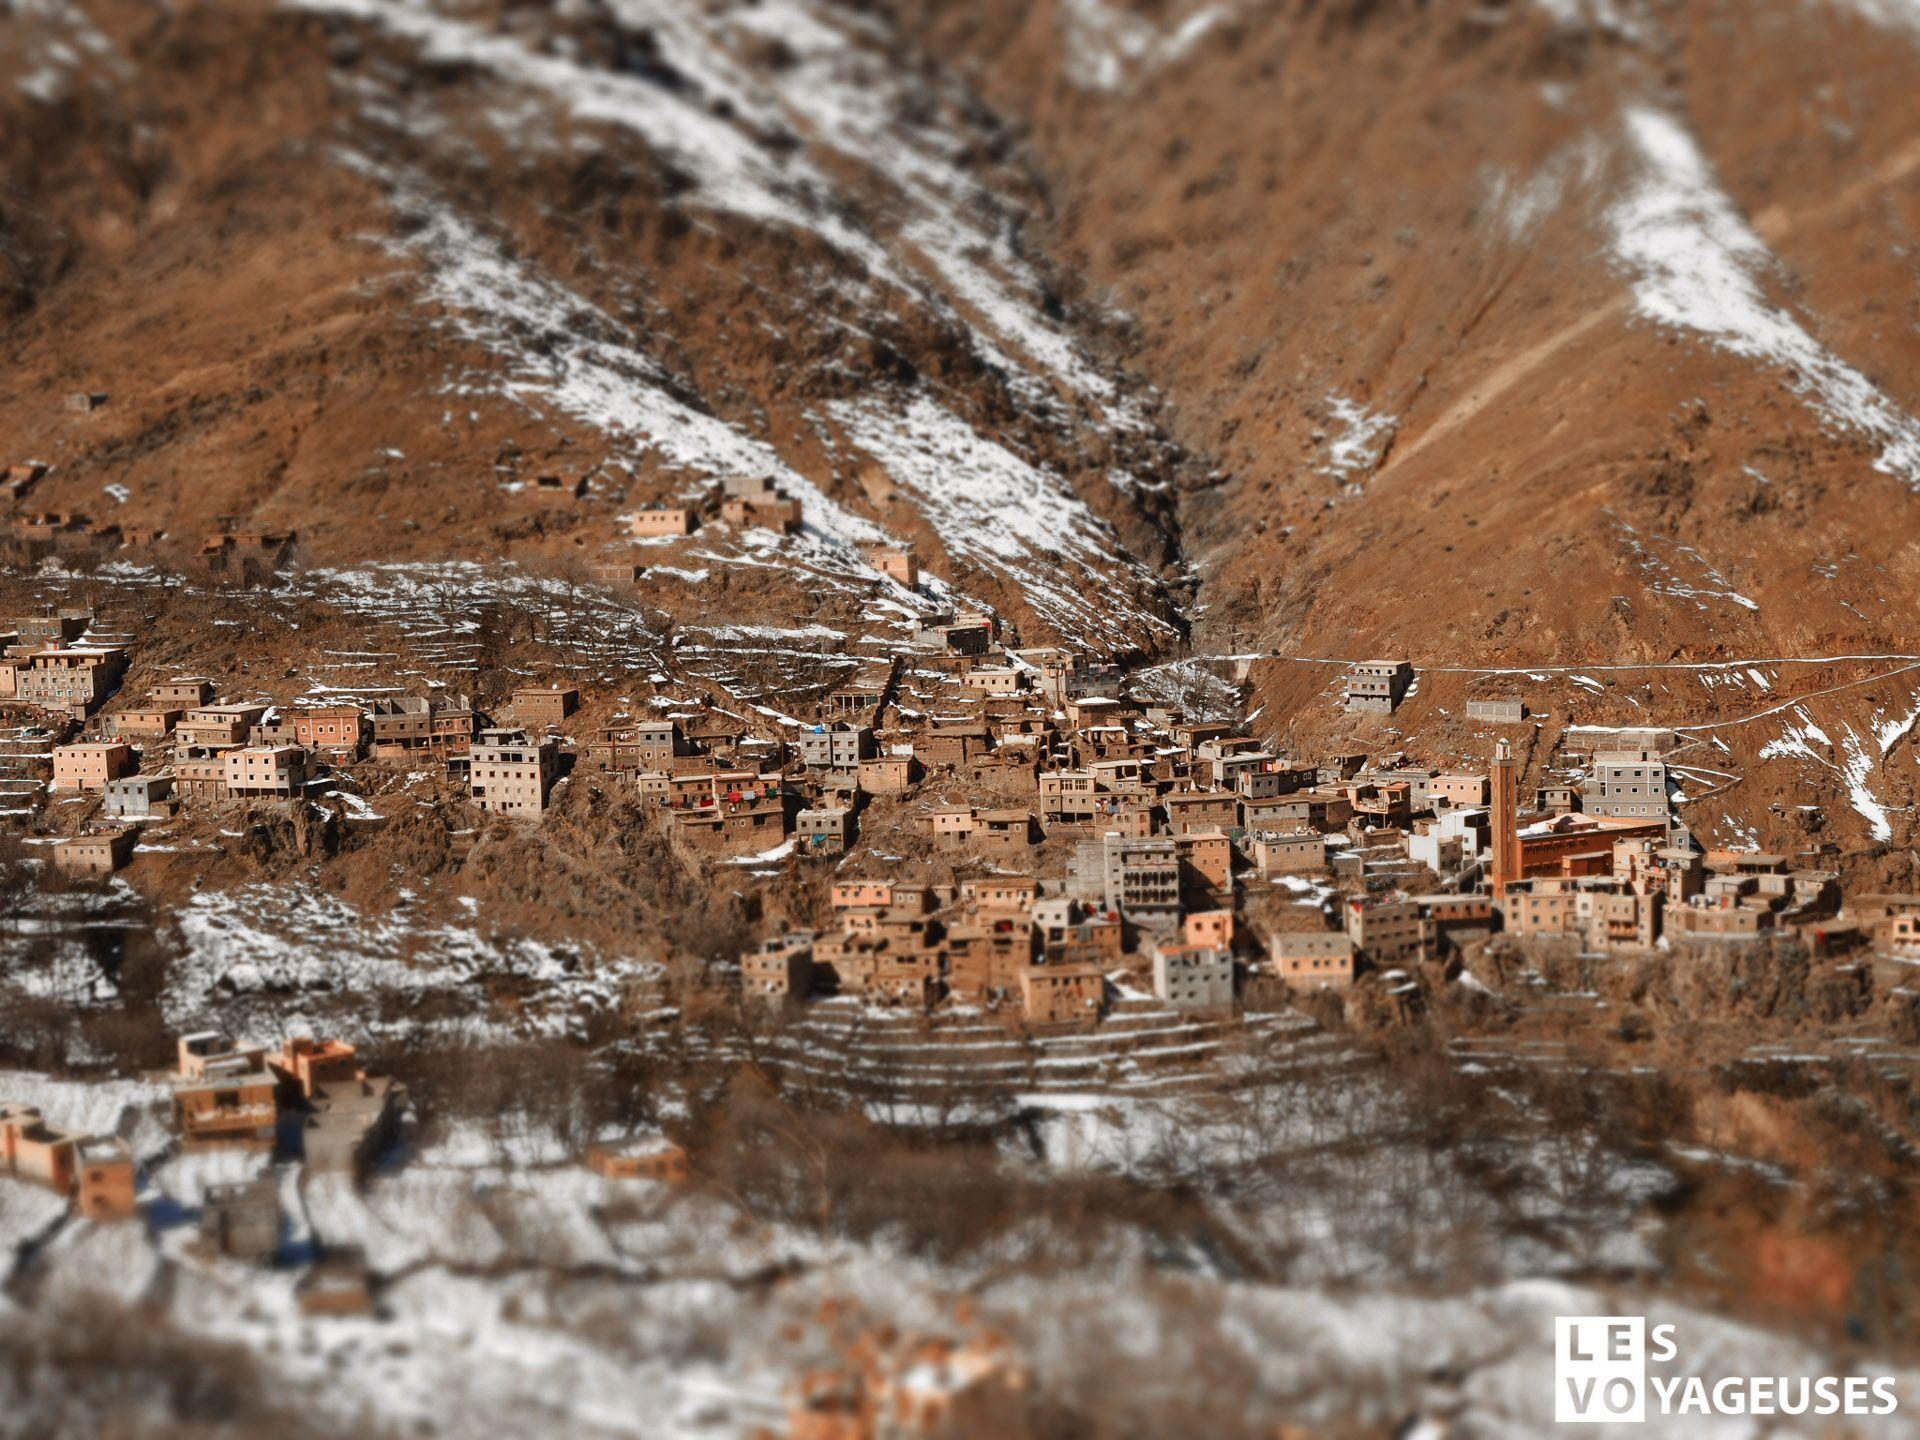 Les-voyageuses-maroc-imlil-hiver-000179